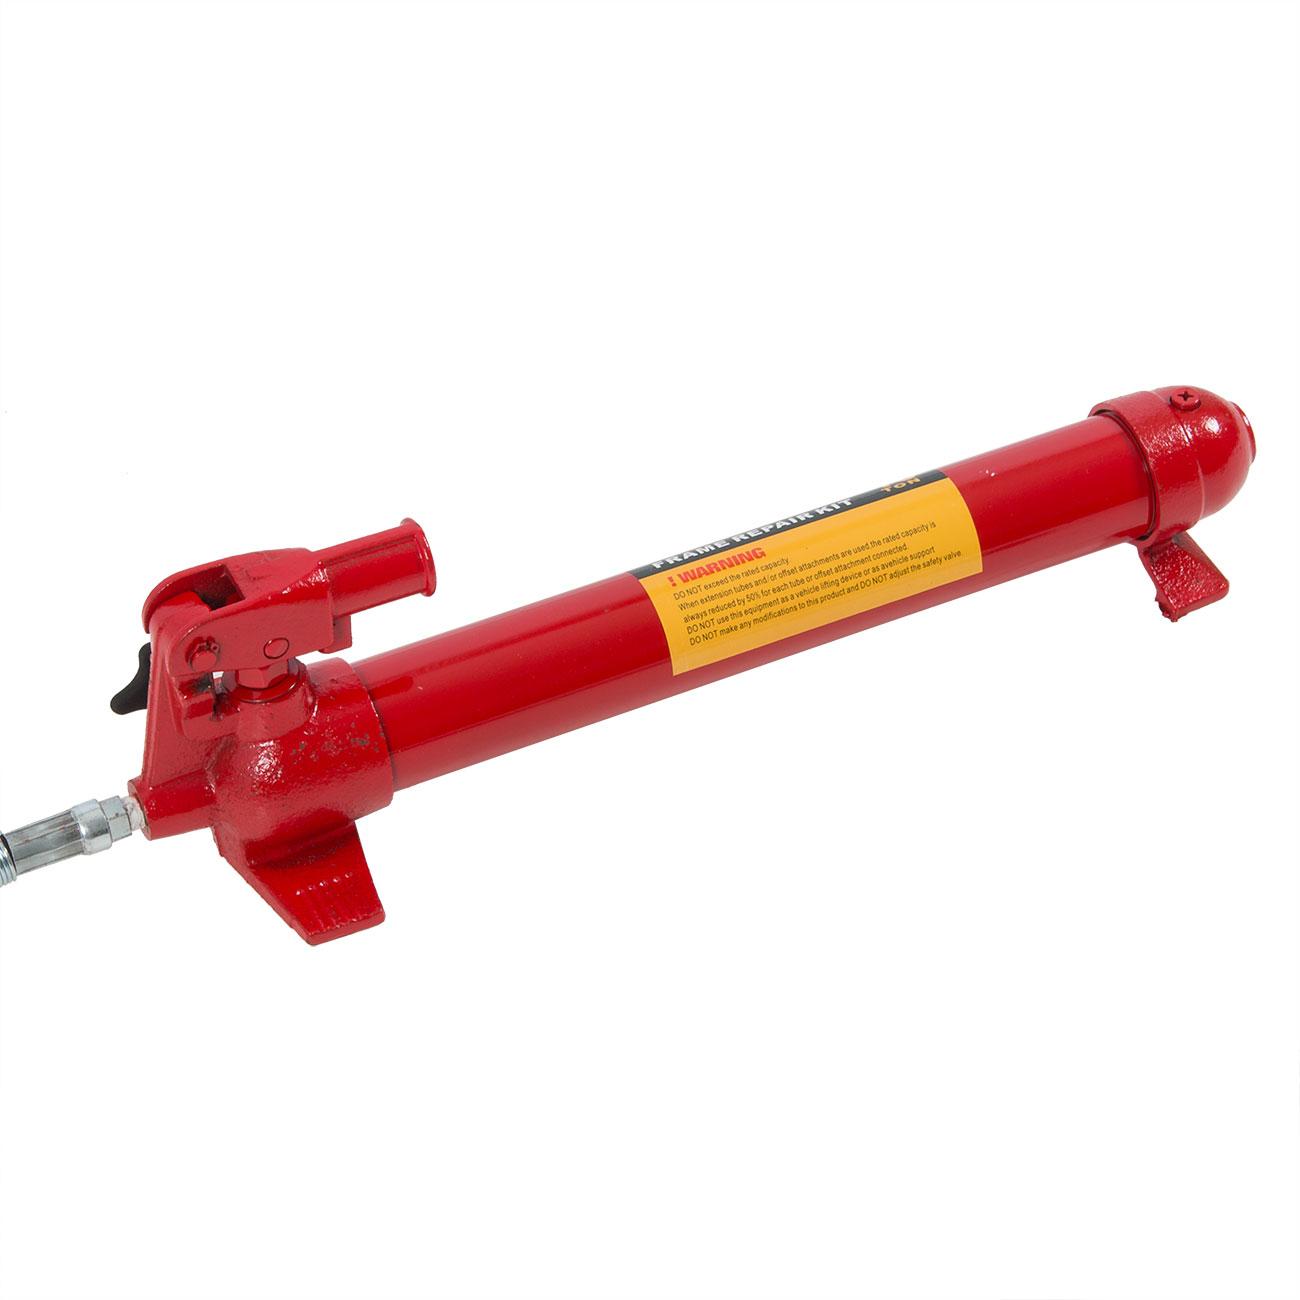 Hydraulic 10 Ton Body Frame Repair Kit Porta Power Tools Auto Shop ...